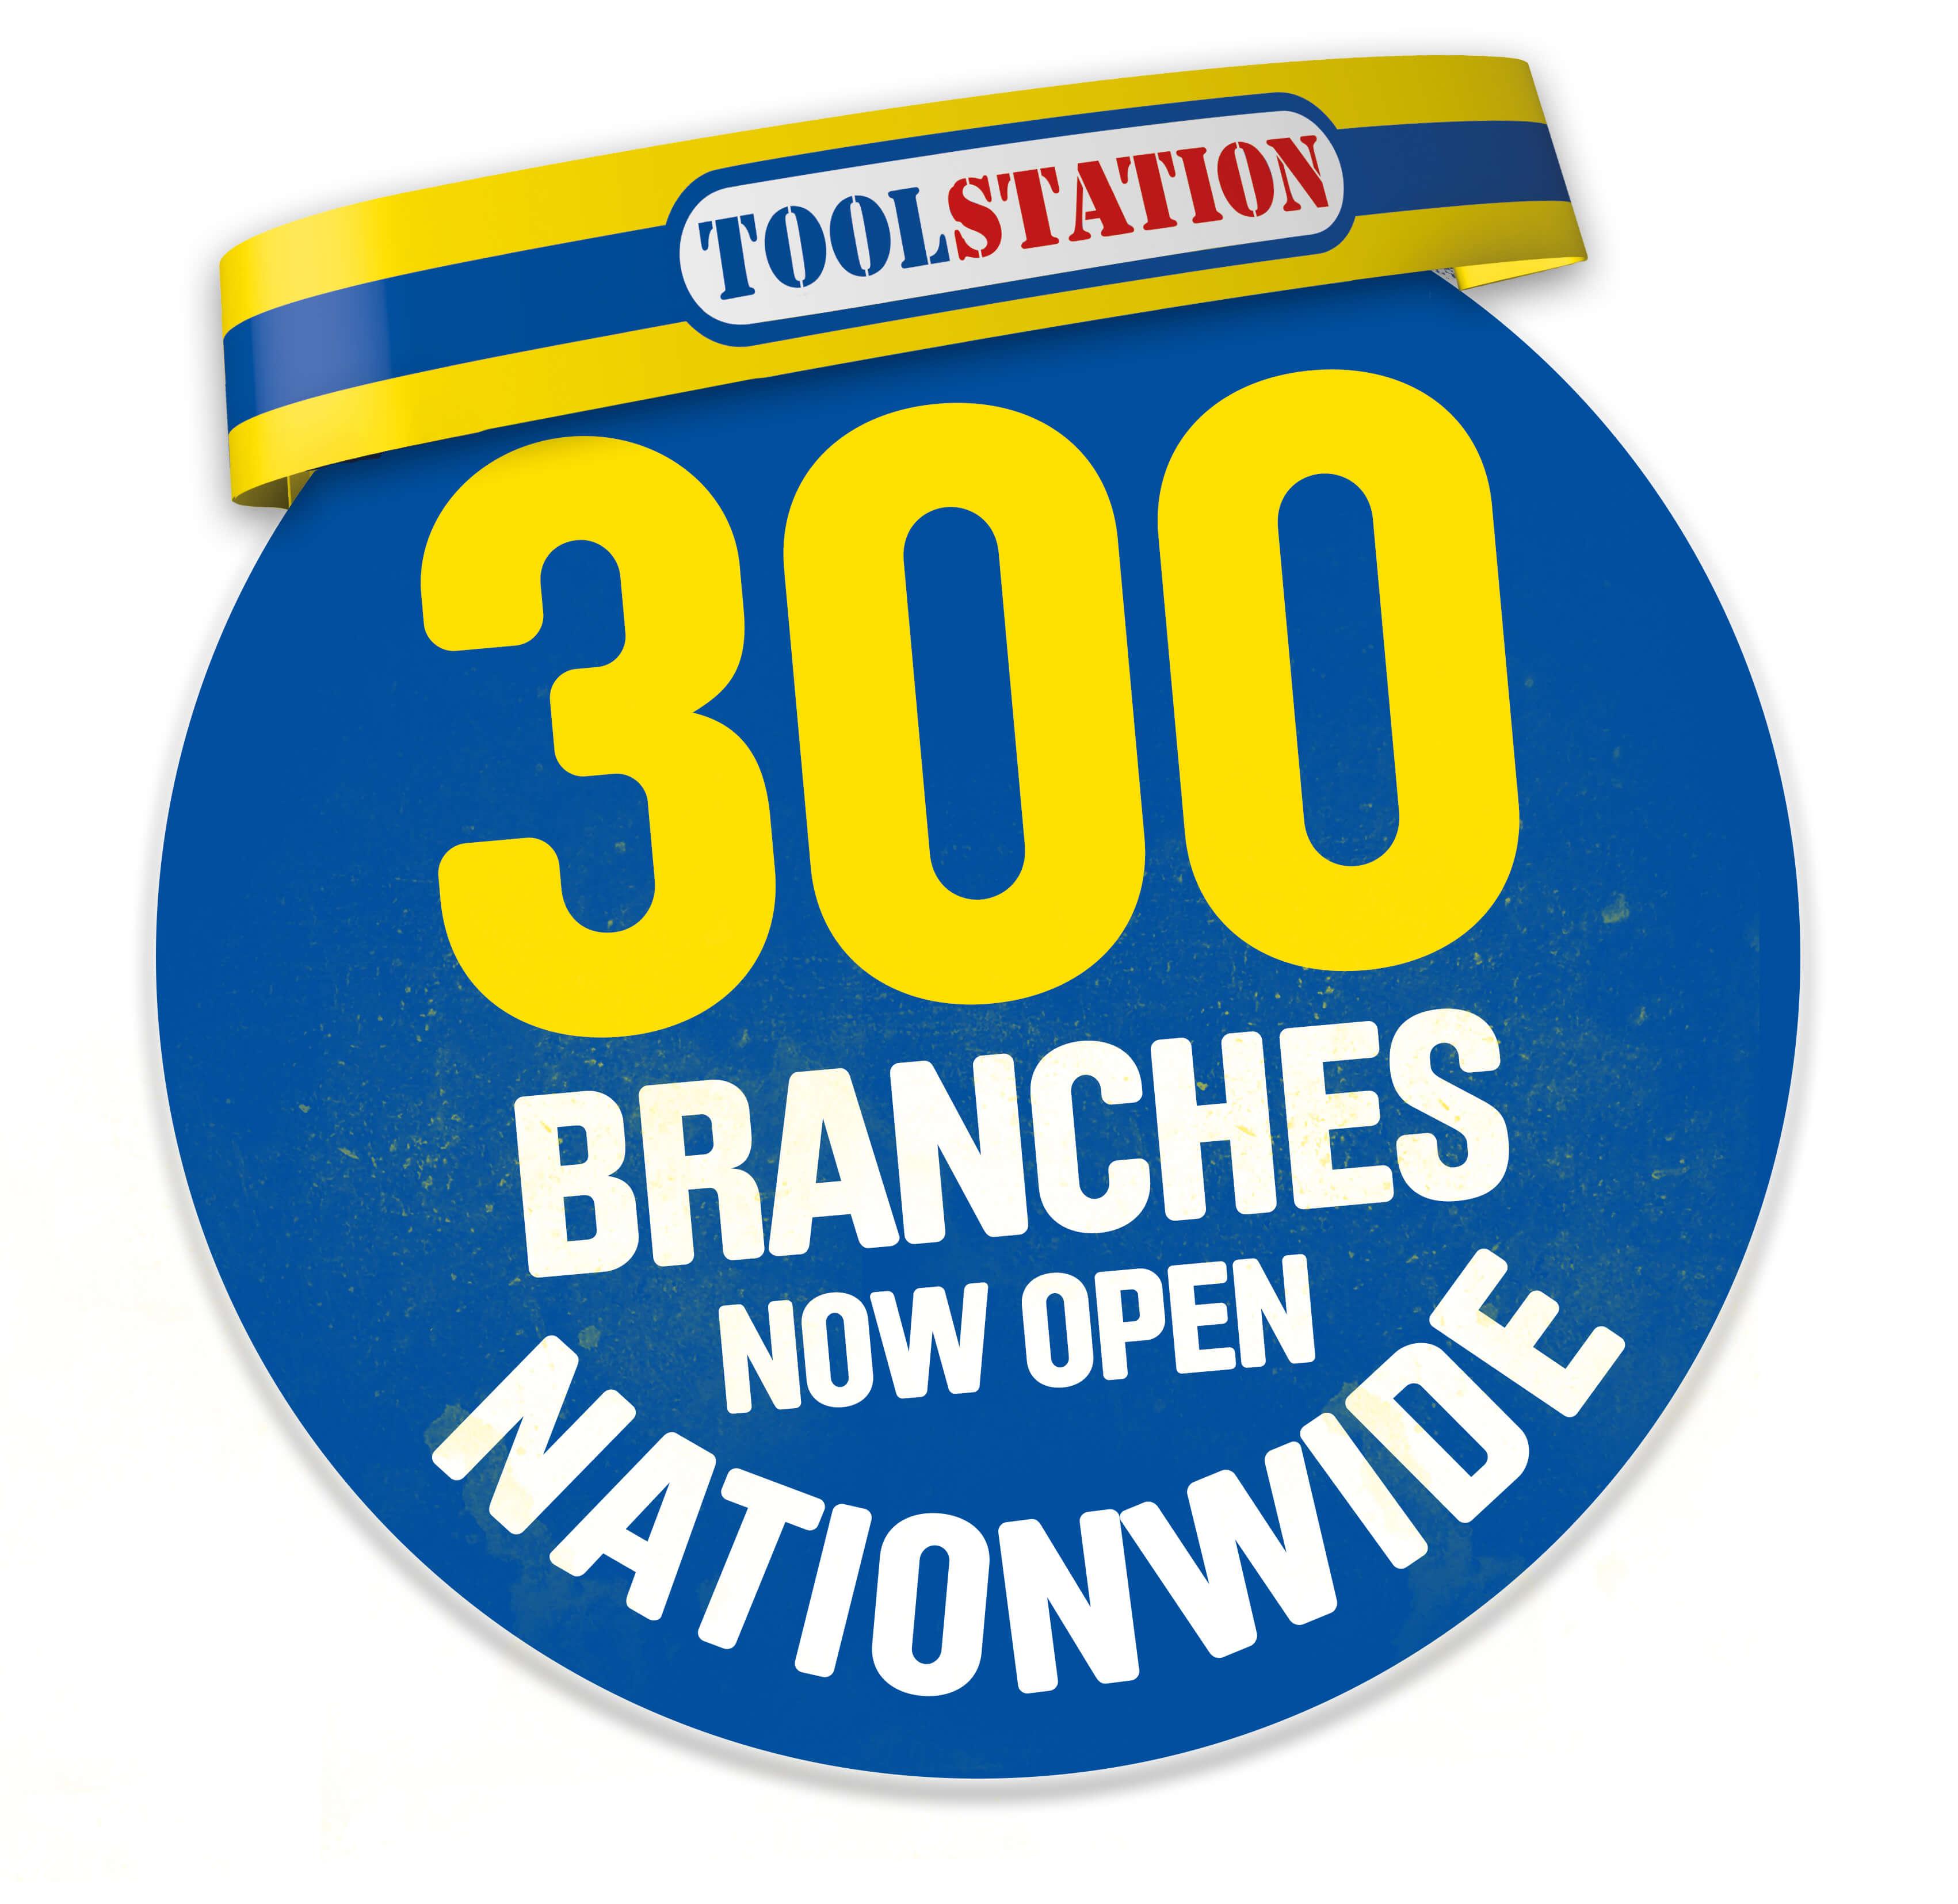 300th Branch Celebration – Eastleigh